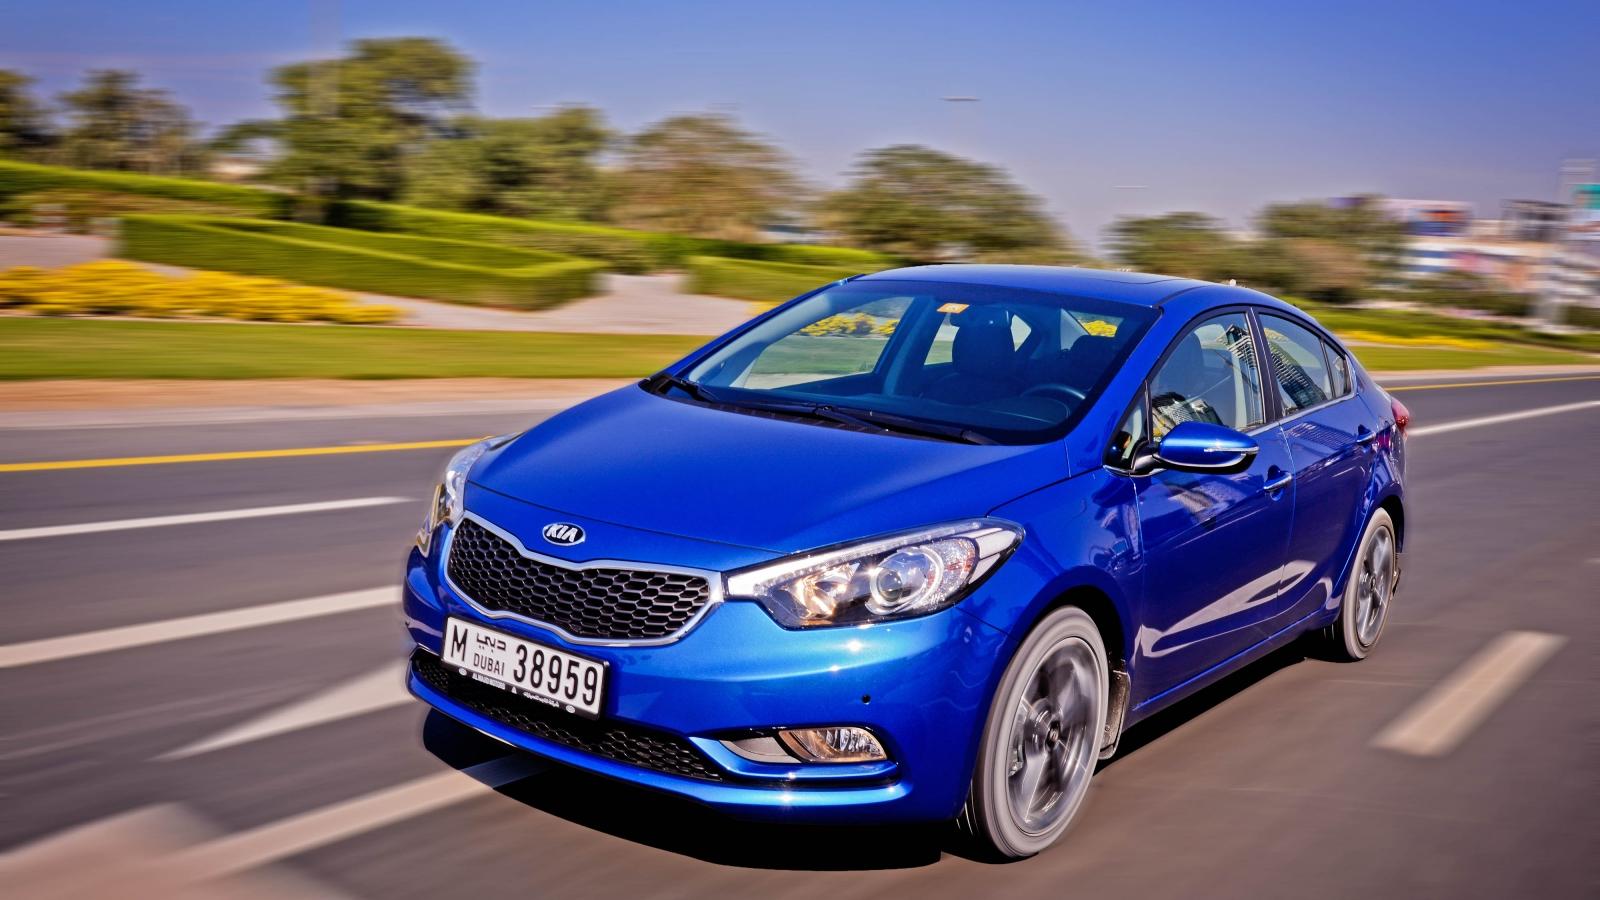 اجاره خودرو کیا سراتو - اجاره ماشین - اجاره خودرو - کرایه ماشین